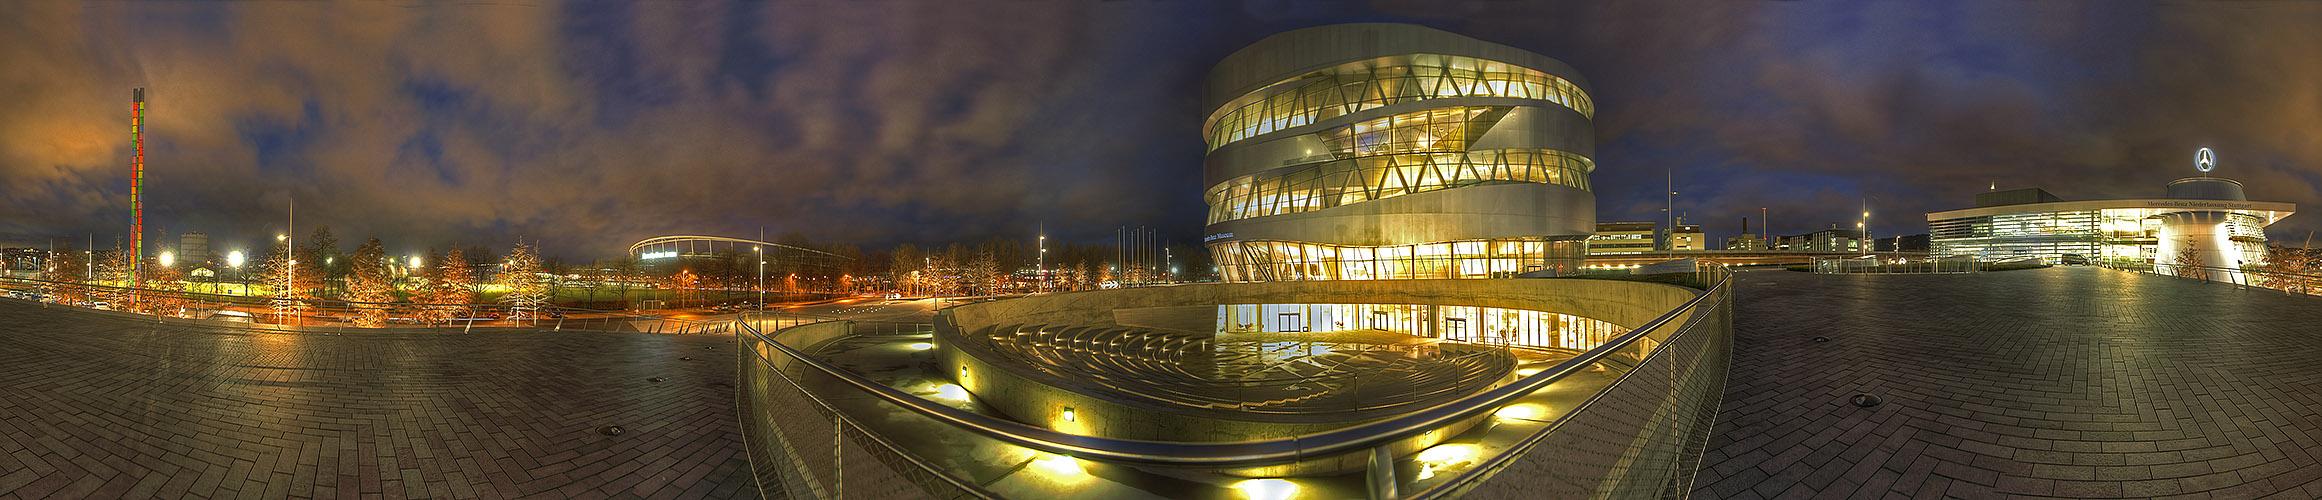 360° Panorama vom Mercedes-Benz-Museum in Stuttgart